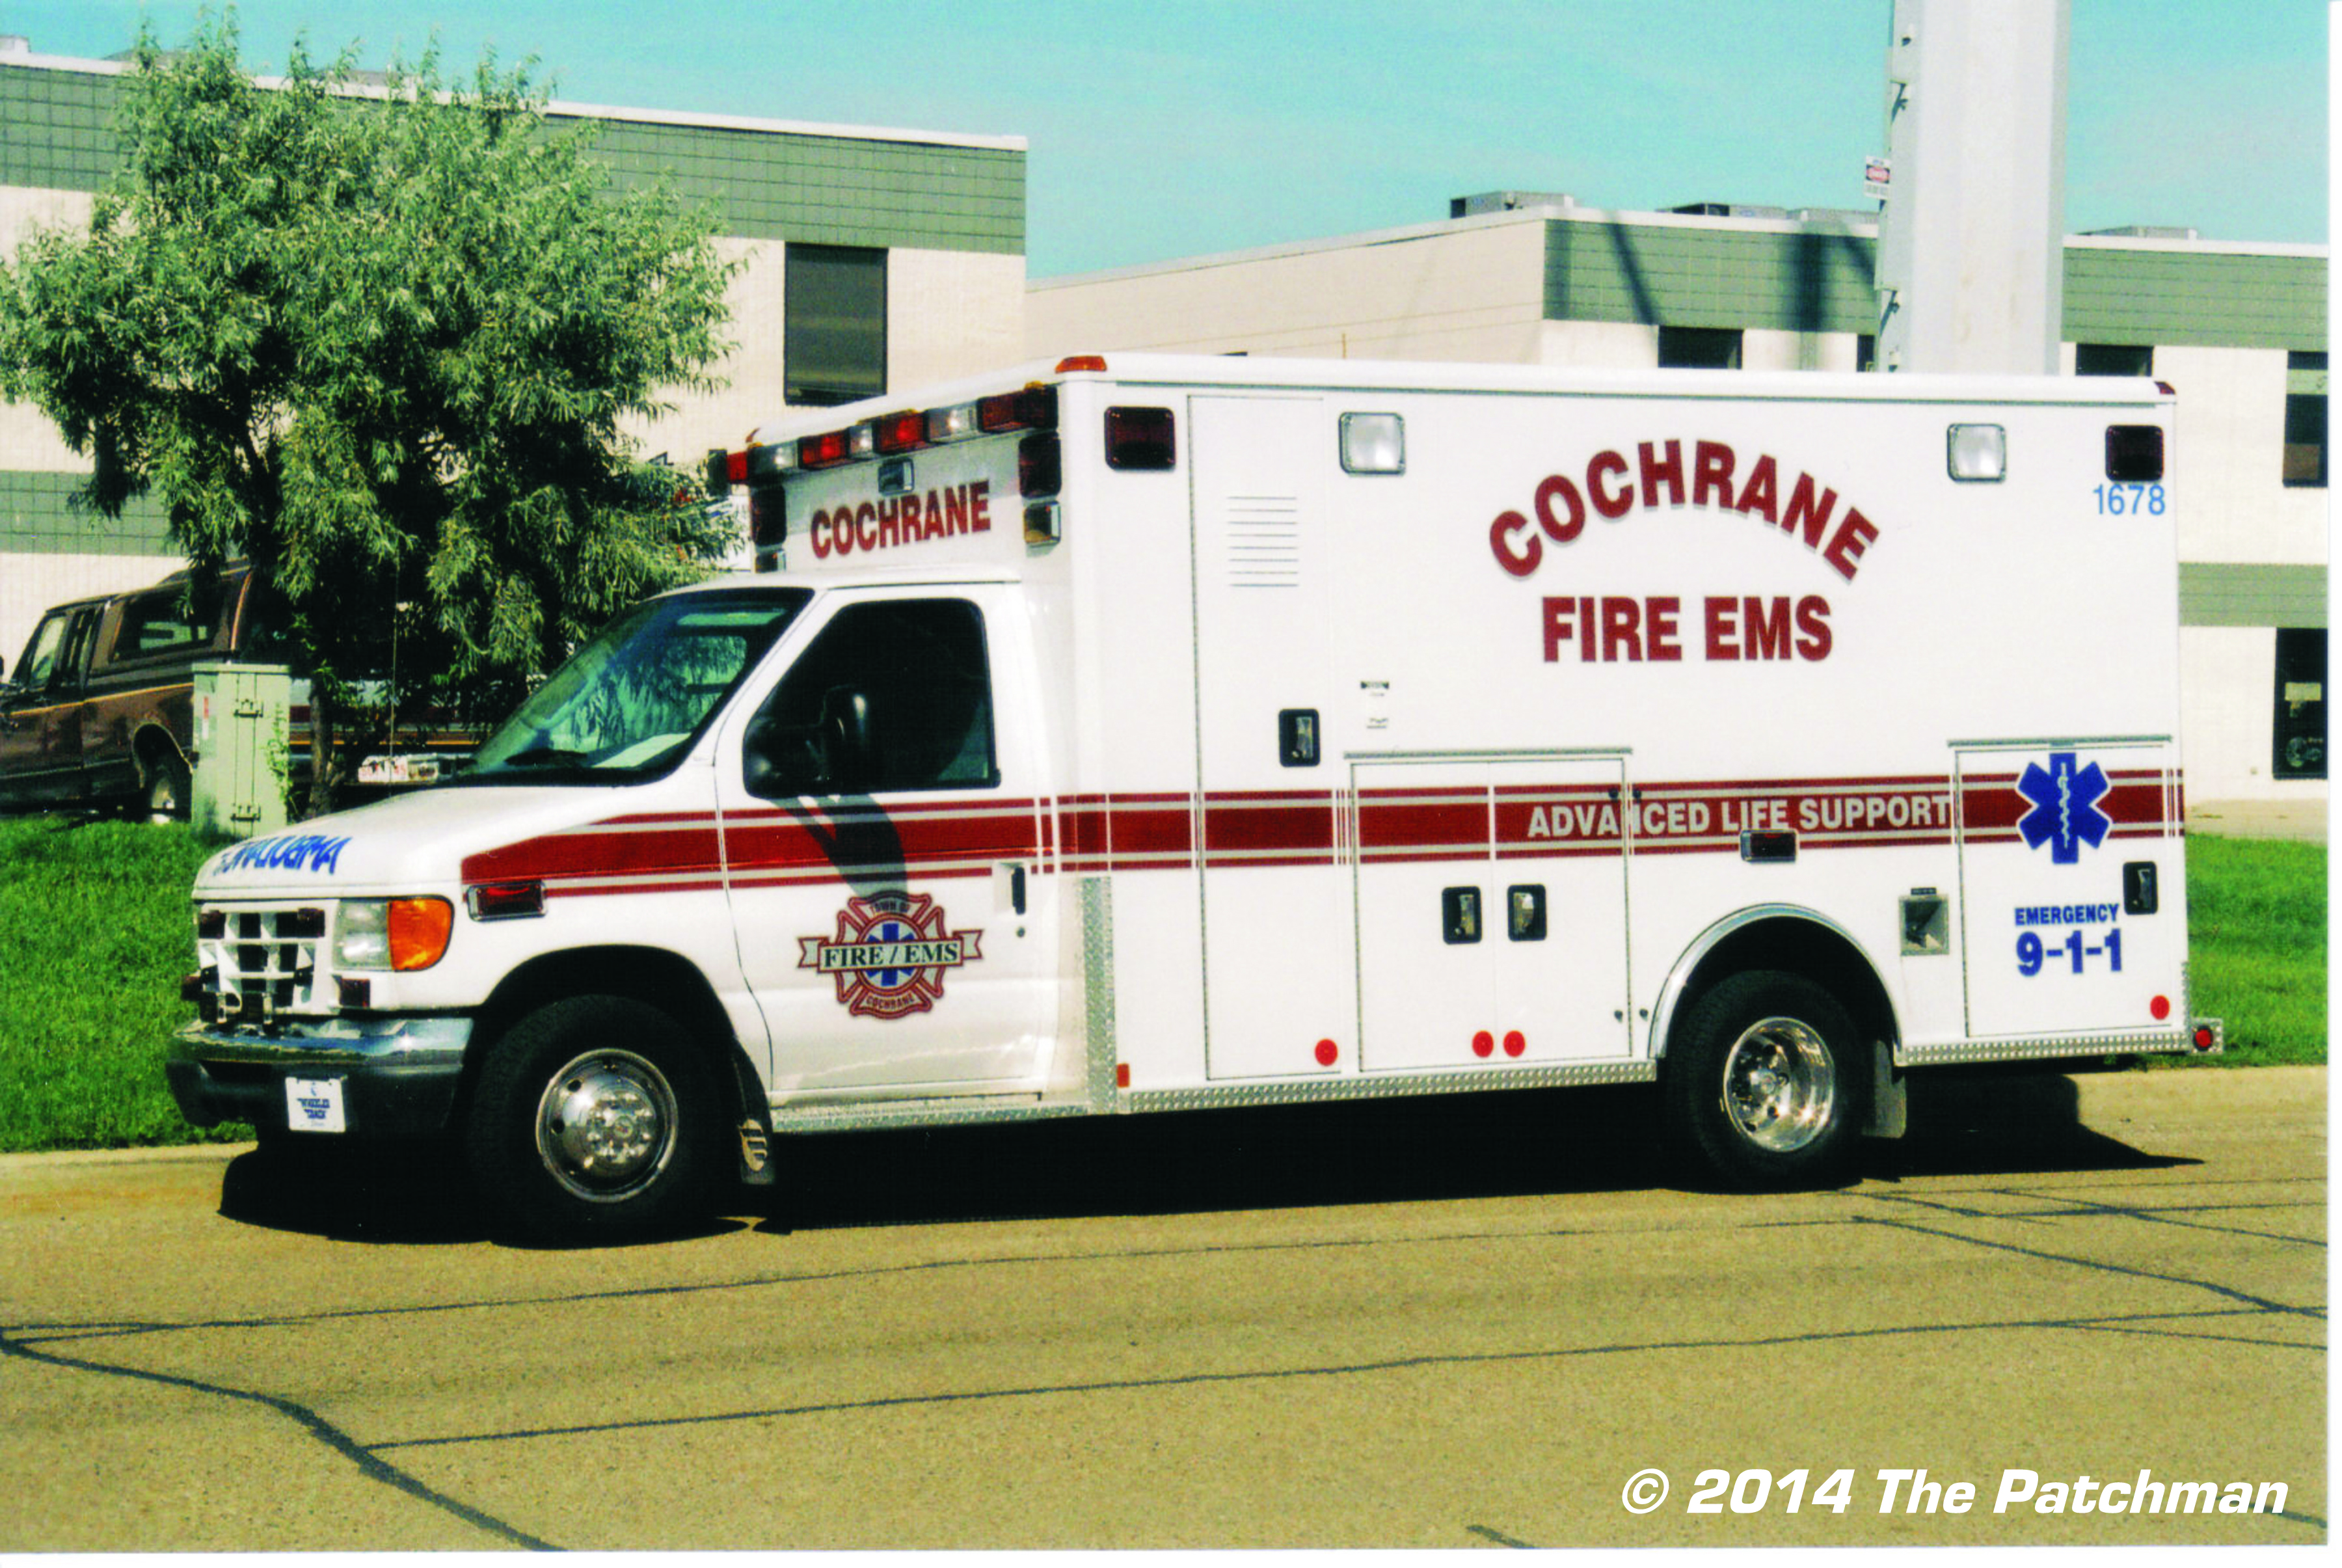 Cochrane Fire EMS